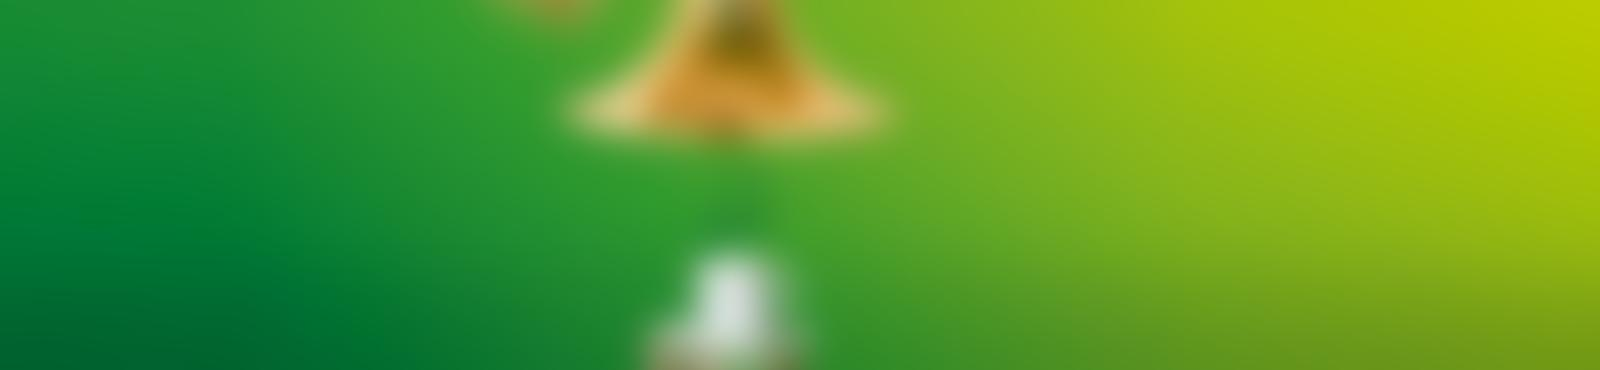 Blurred 23471ee1 644c 47da 92ad dd1659d592d9